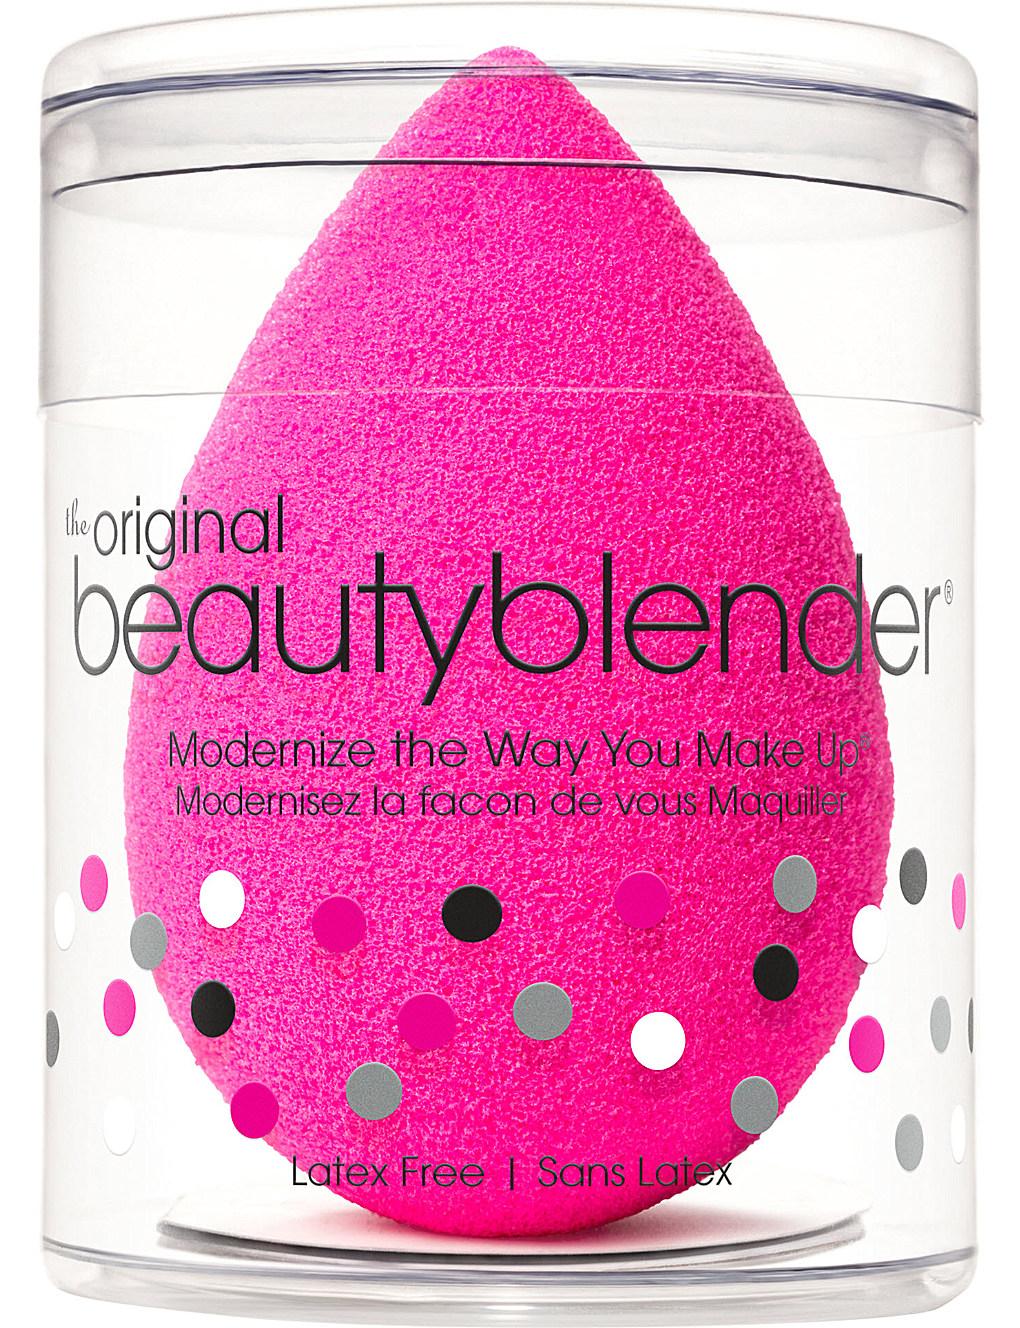 beauty-blender-makeup-classes-nyc.jpg